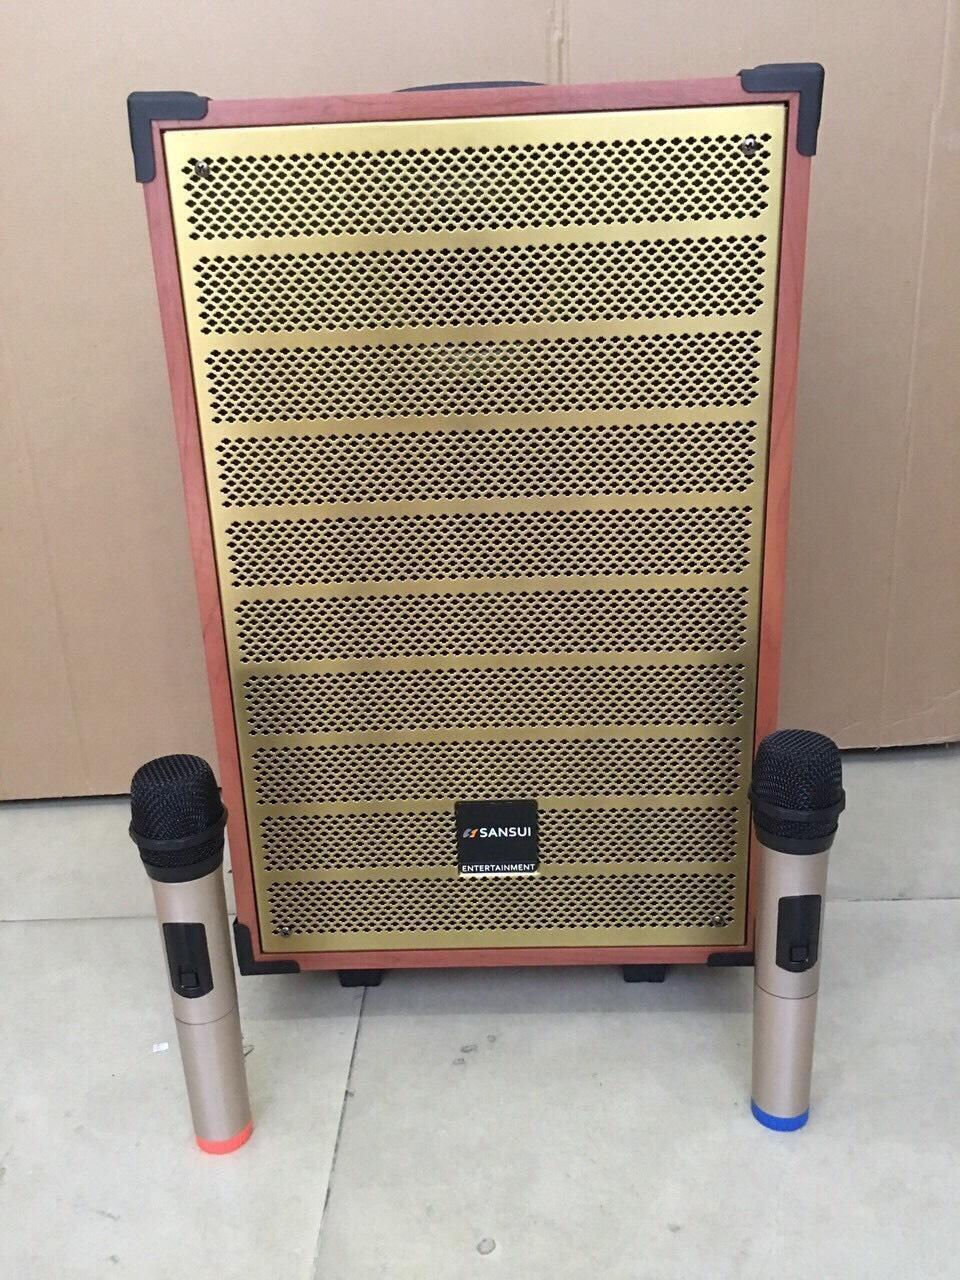 Loa kẹo kéo karaoke Sansui SG 12-18 loa thùng gỗ dày bass 3 tấc siêu hay